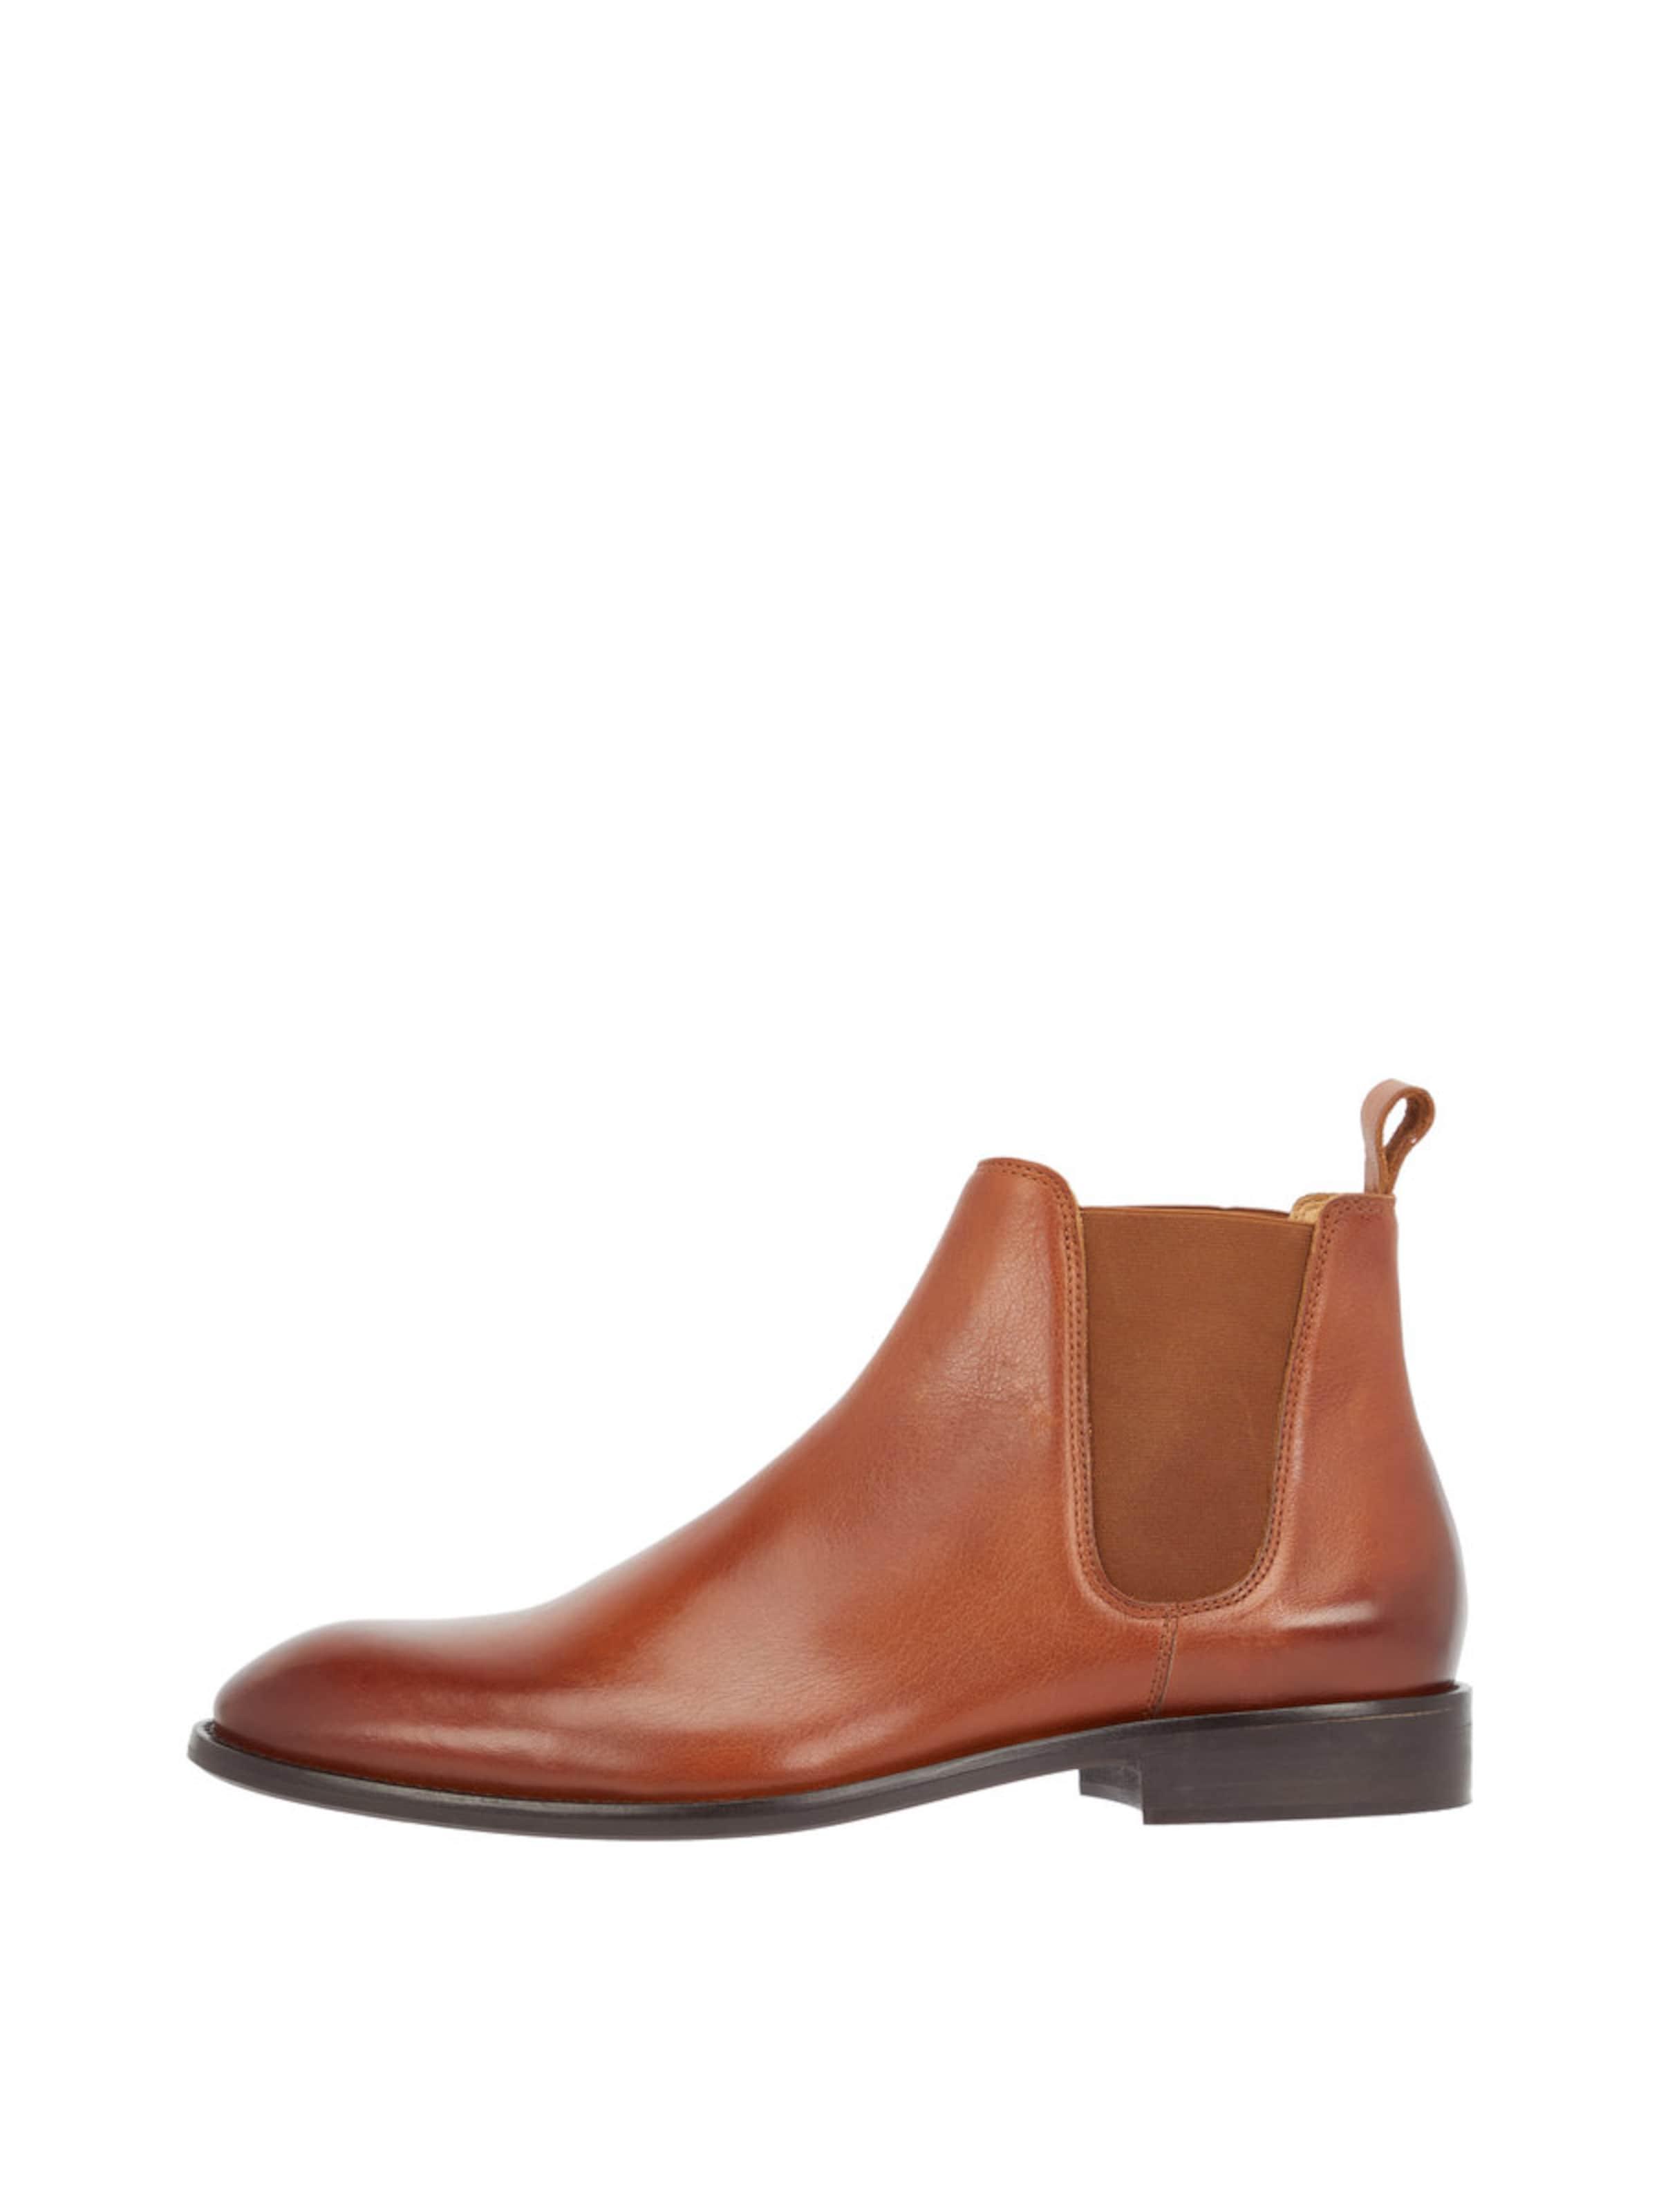 Bianco Chelsea Boots Verschleißfeste billige Schuhe